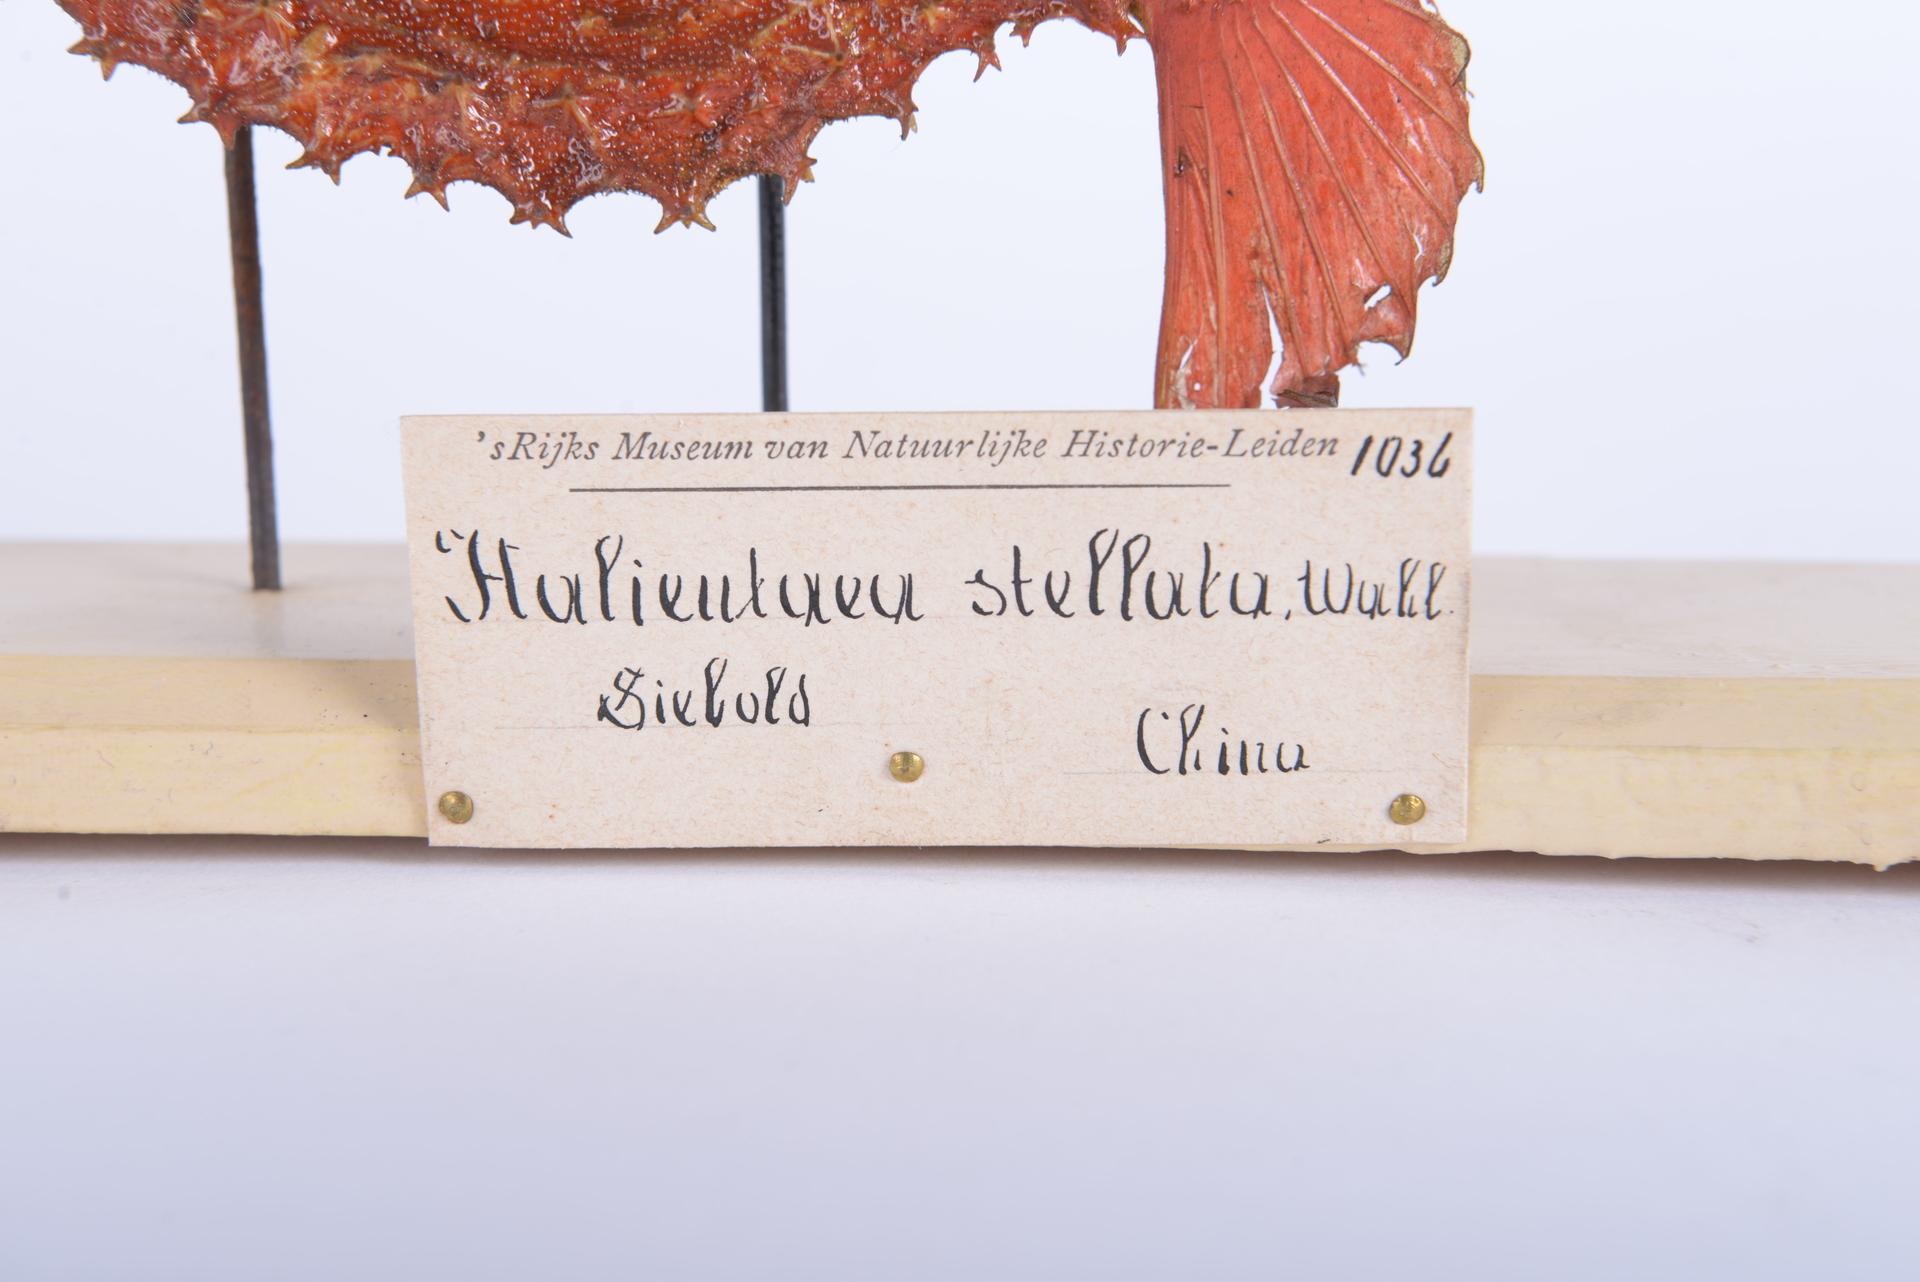 RMNH.PISC.D.1036 | Halicutaea stellata (Vahl 1797)